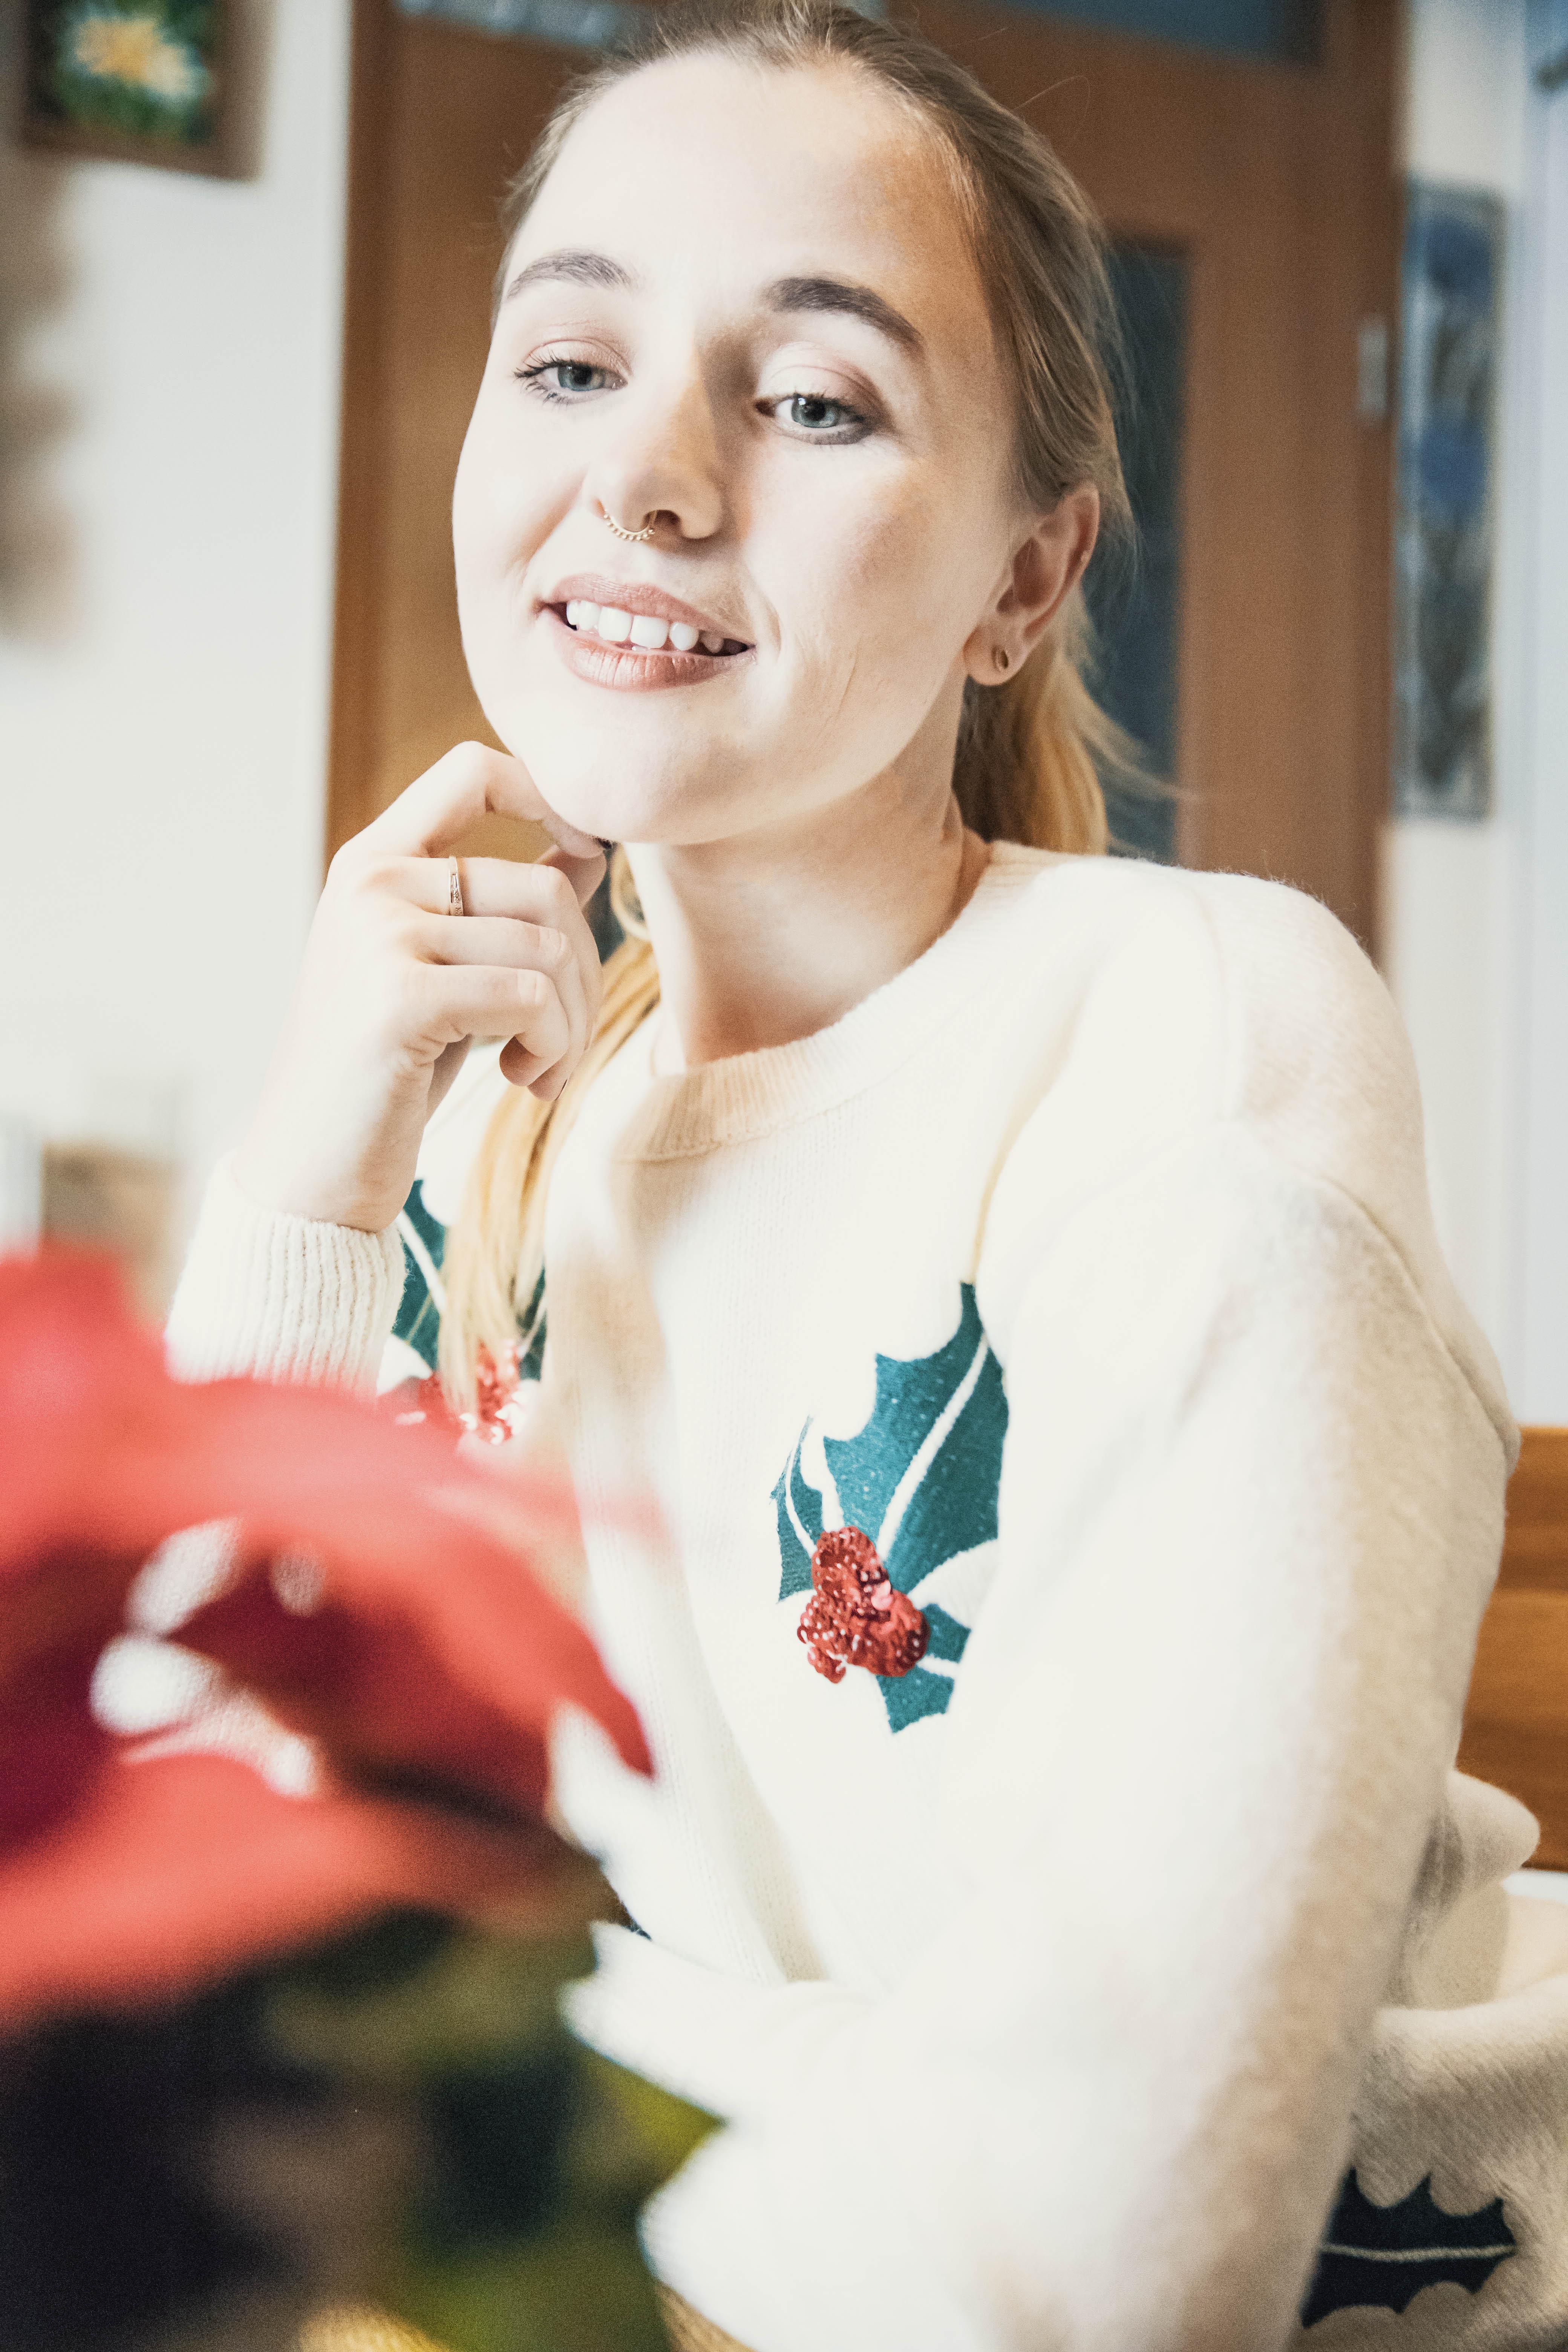 Christmas Haul Pullovers Weihnachtshaul Pullover Morning Elegance Adventskalender